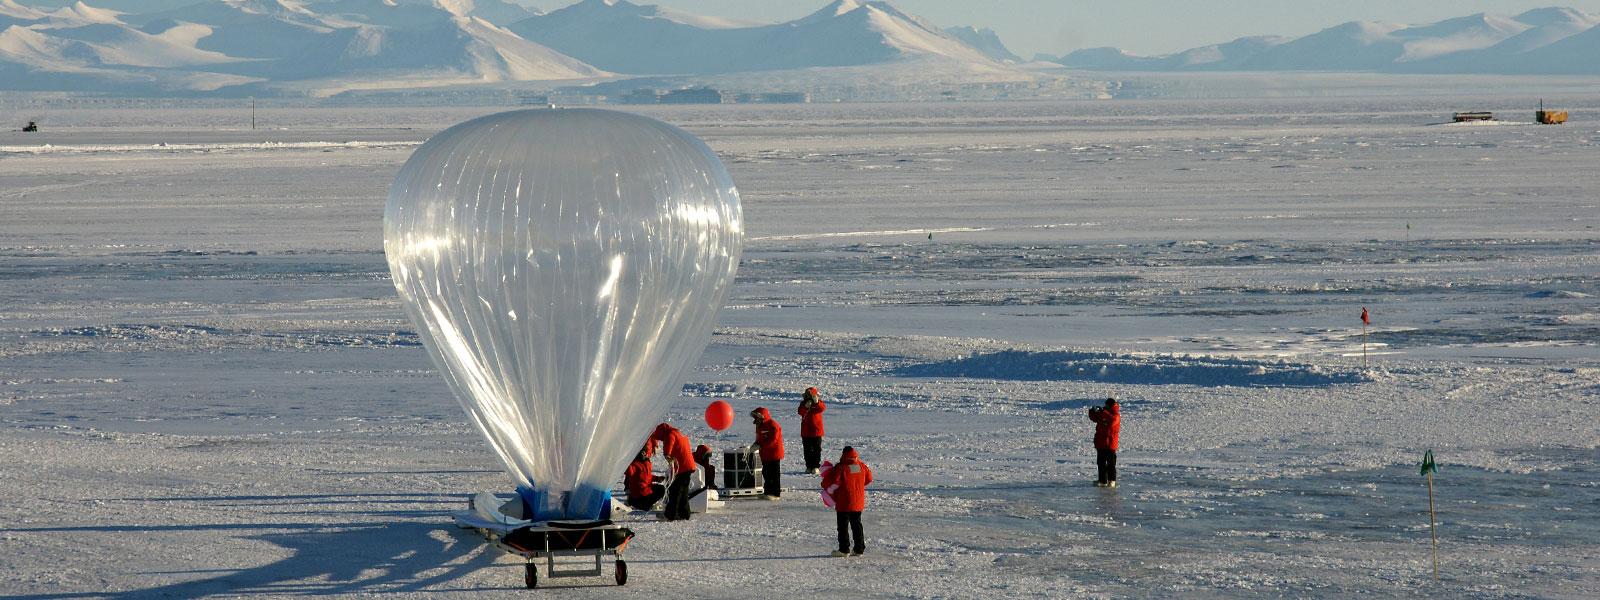 2010_Aerospace_ballons_stratospherique_pressurise_CNES-1600x600